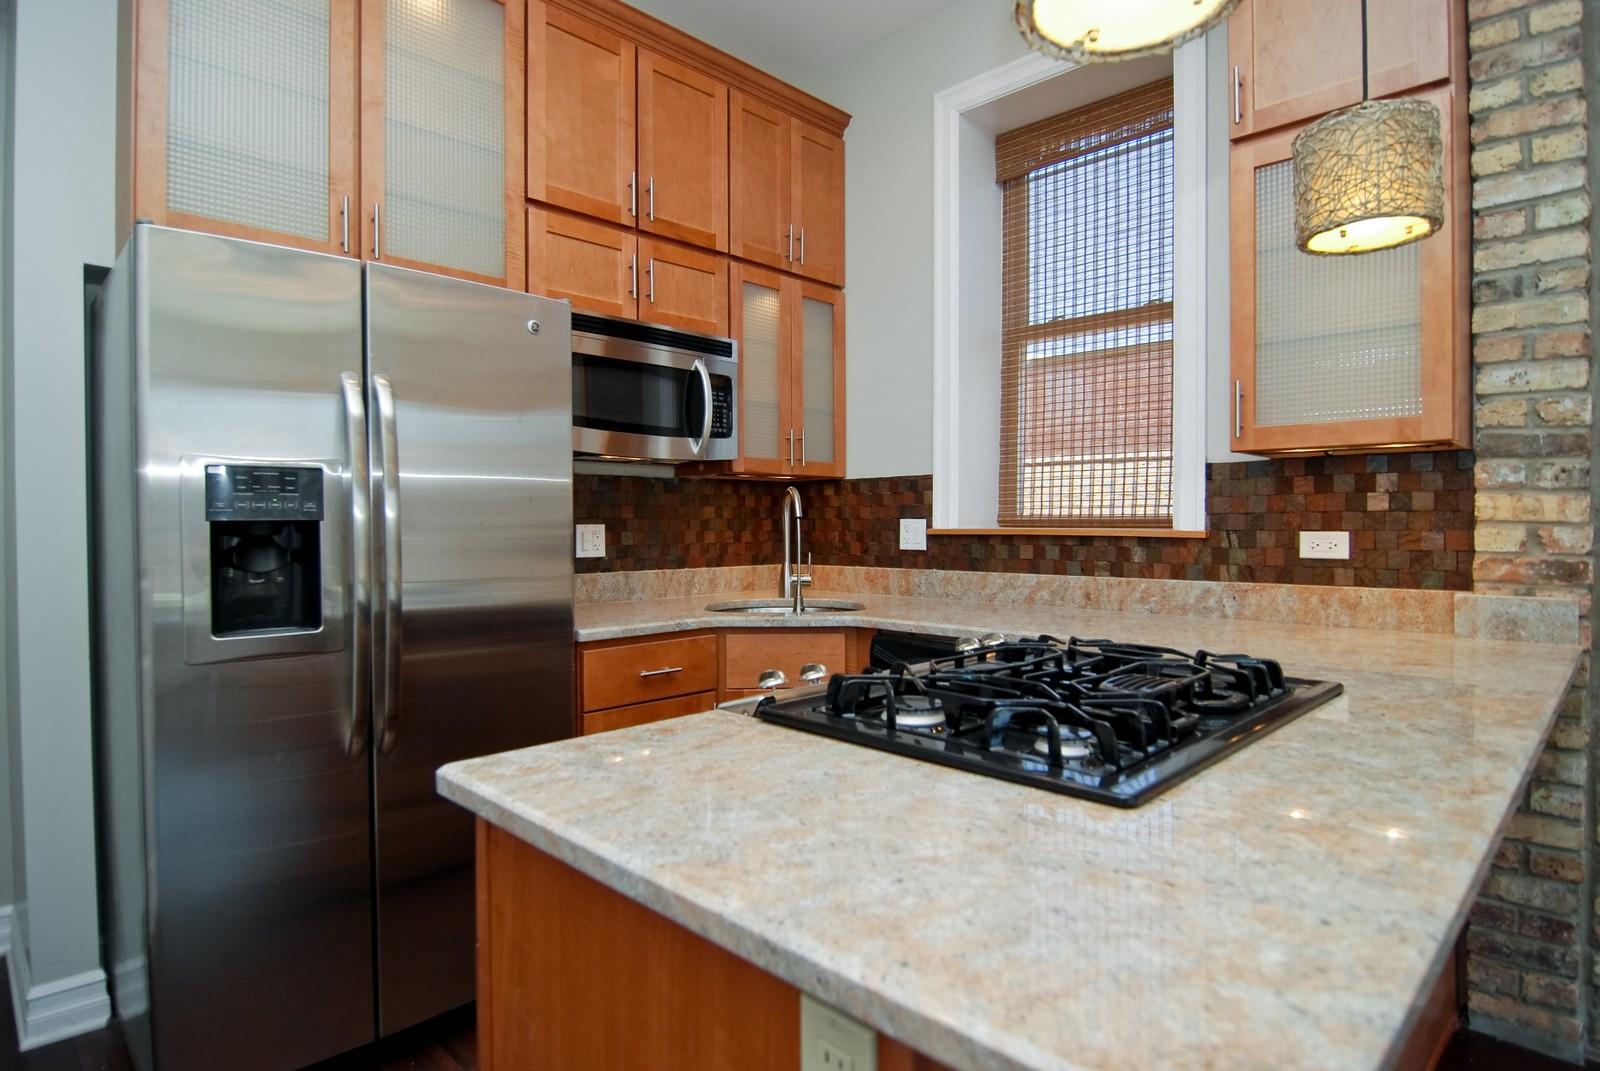 Real Estate Photography - 1744 W Augusta, Chicago, IL, 60622 - Kitchen